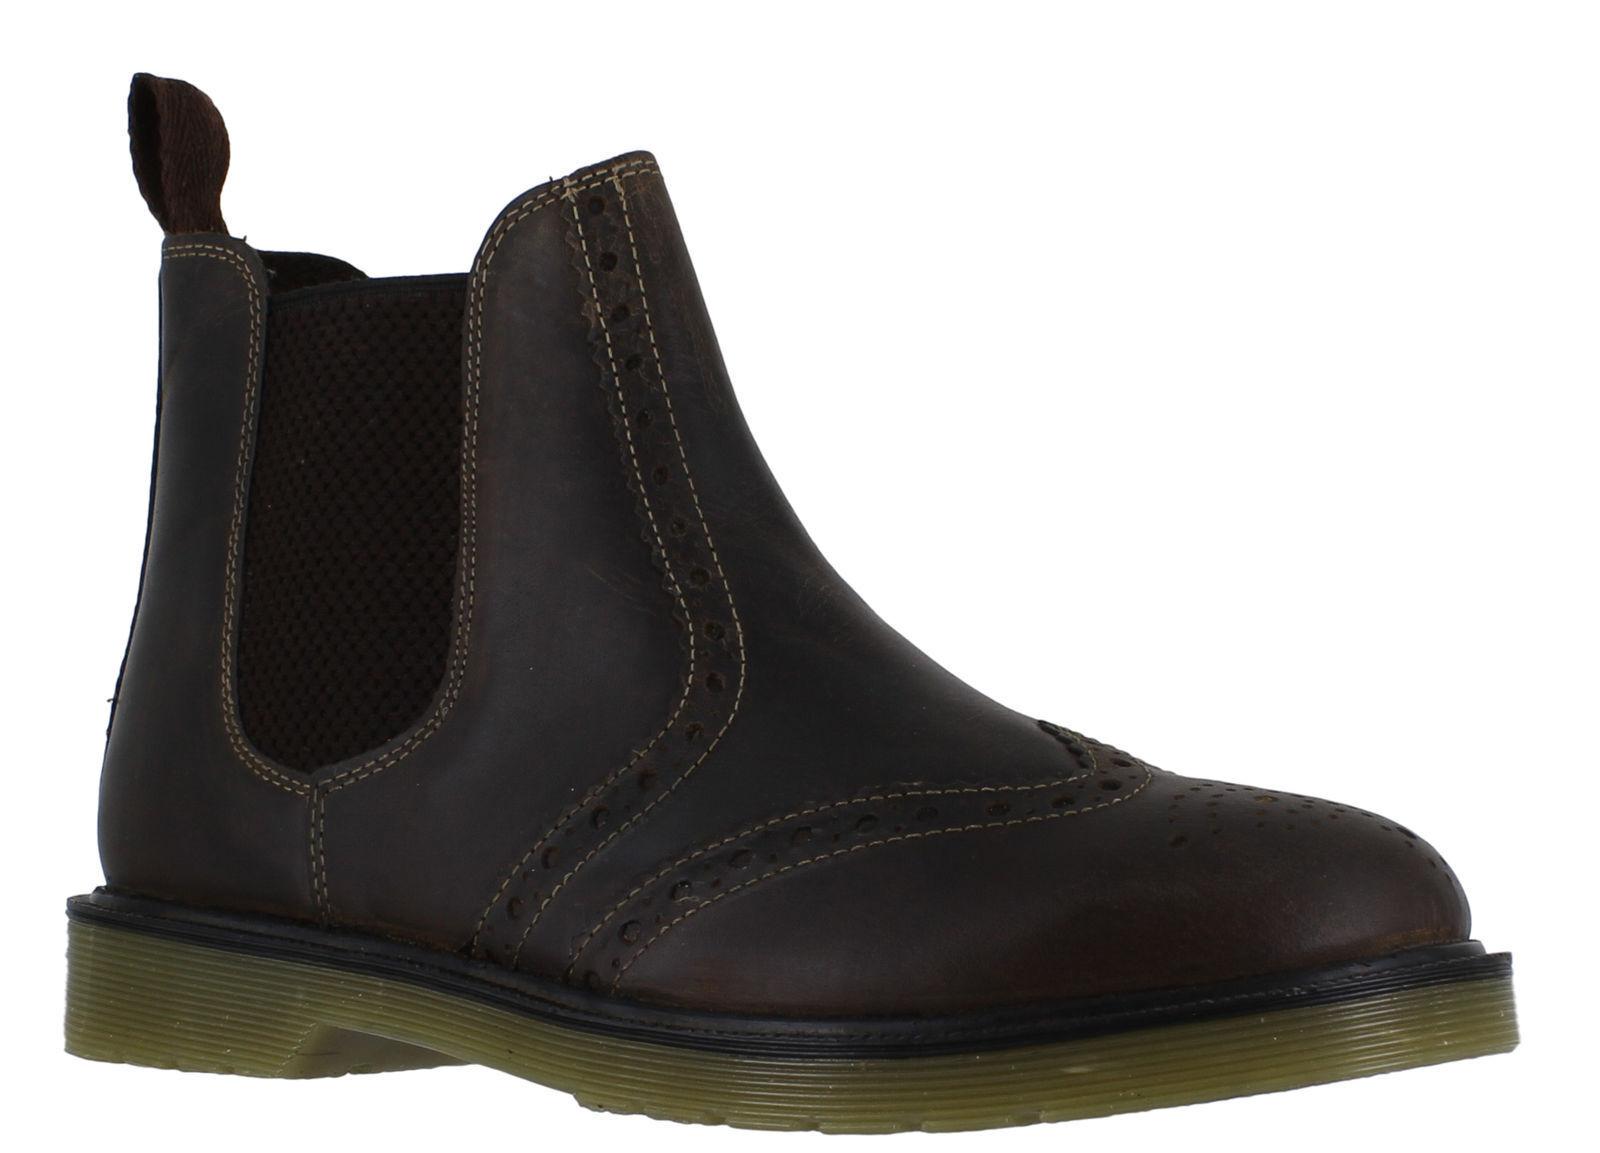 MEN'S OAKTRAK Brown Leather Belper Chelsea Pull on ankle boots Brown OAKTRAK UK size 9 0ce1f0